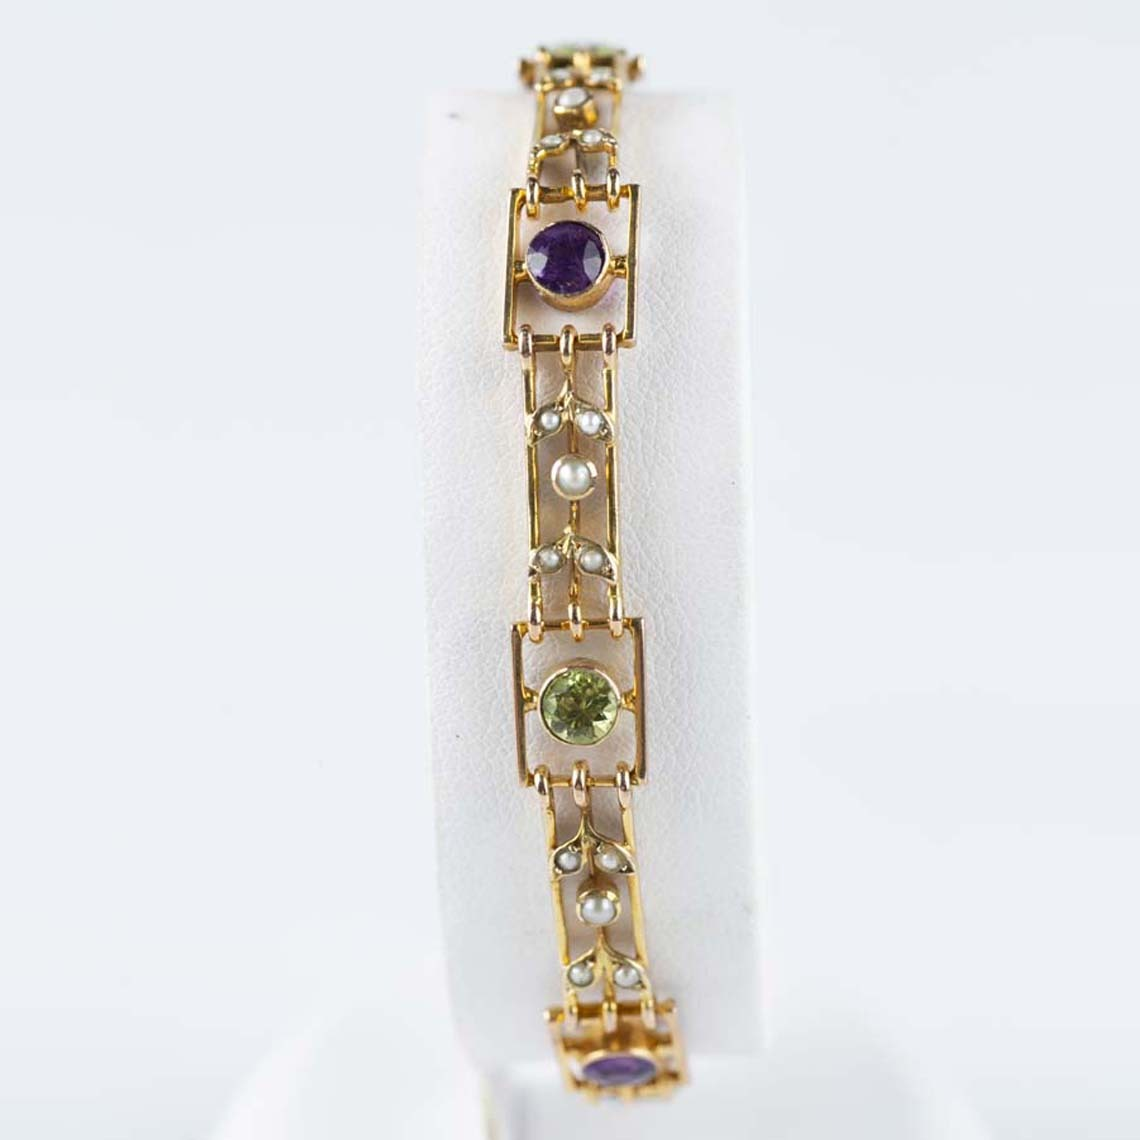 Peridot, amethyst and pearl bracelet